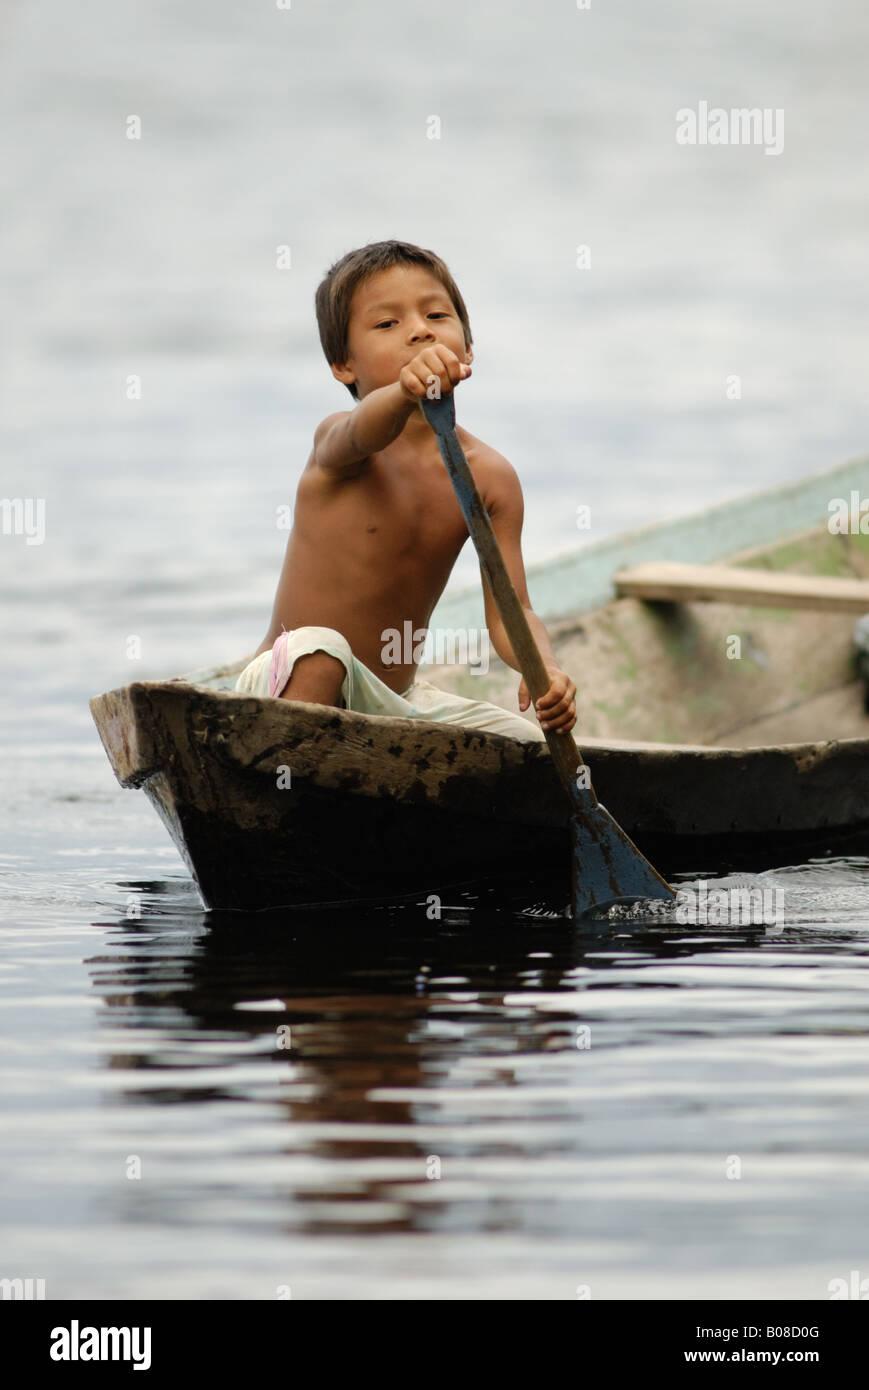 Boy from the Amazon paddling a canoe - Stock Image